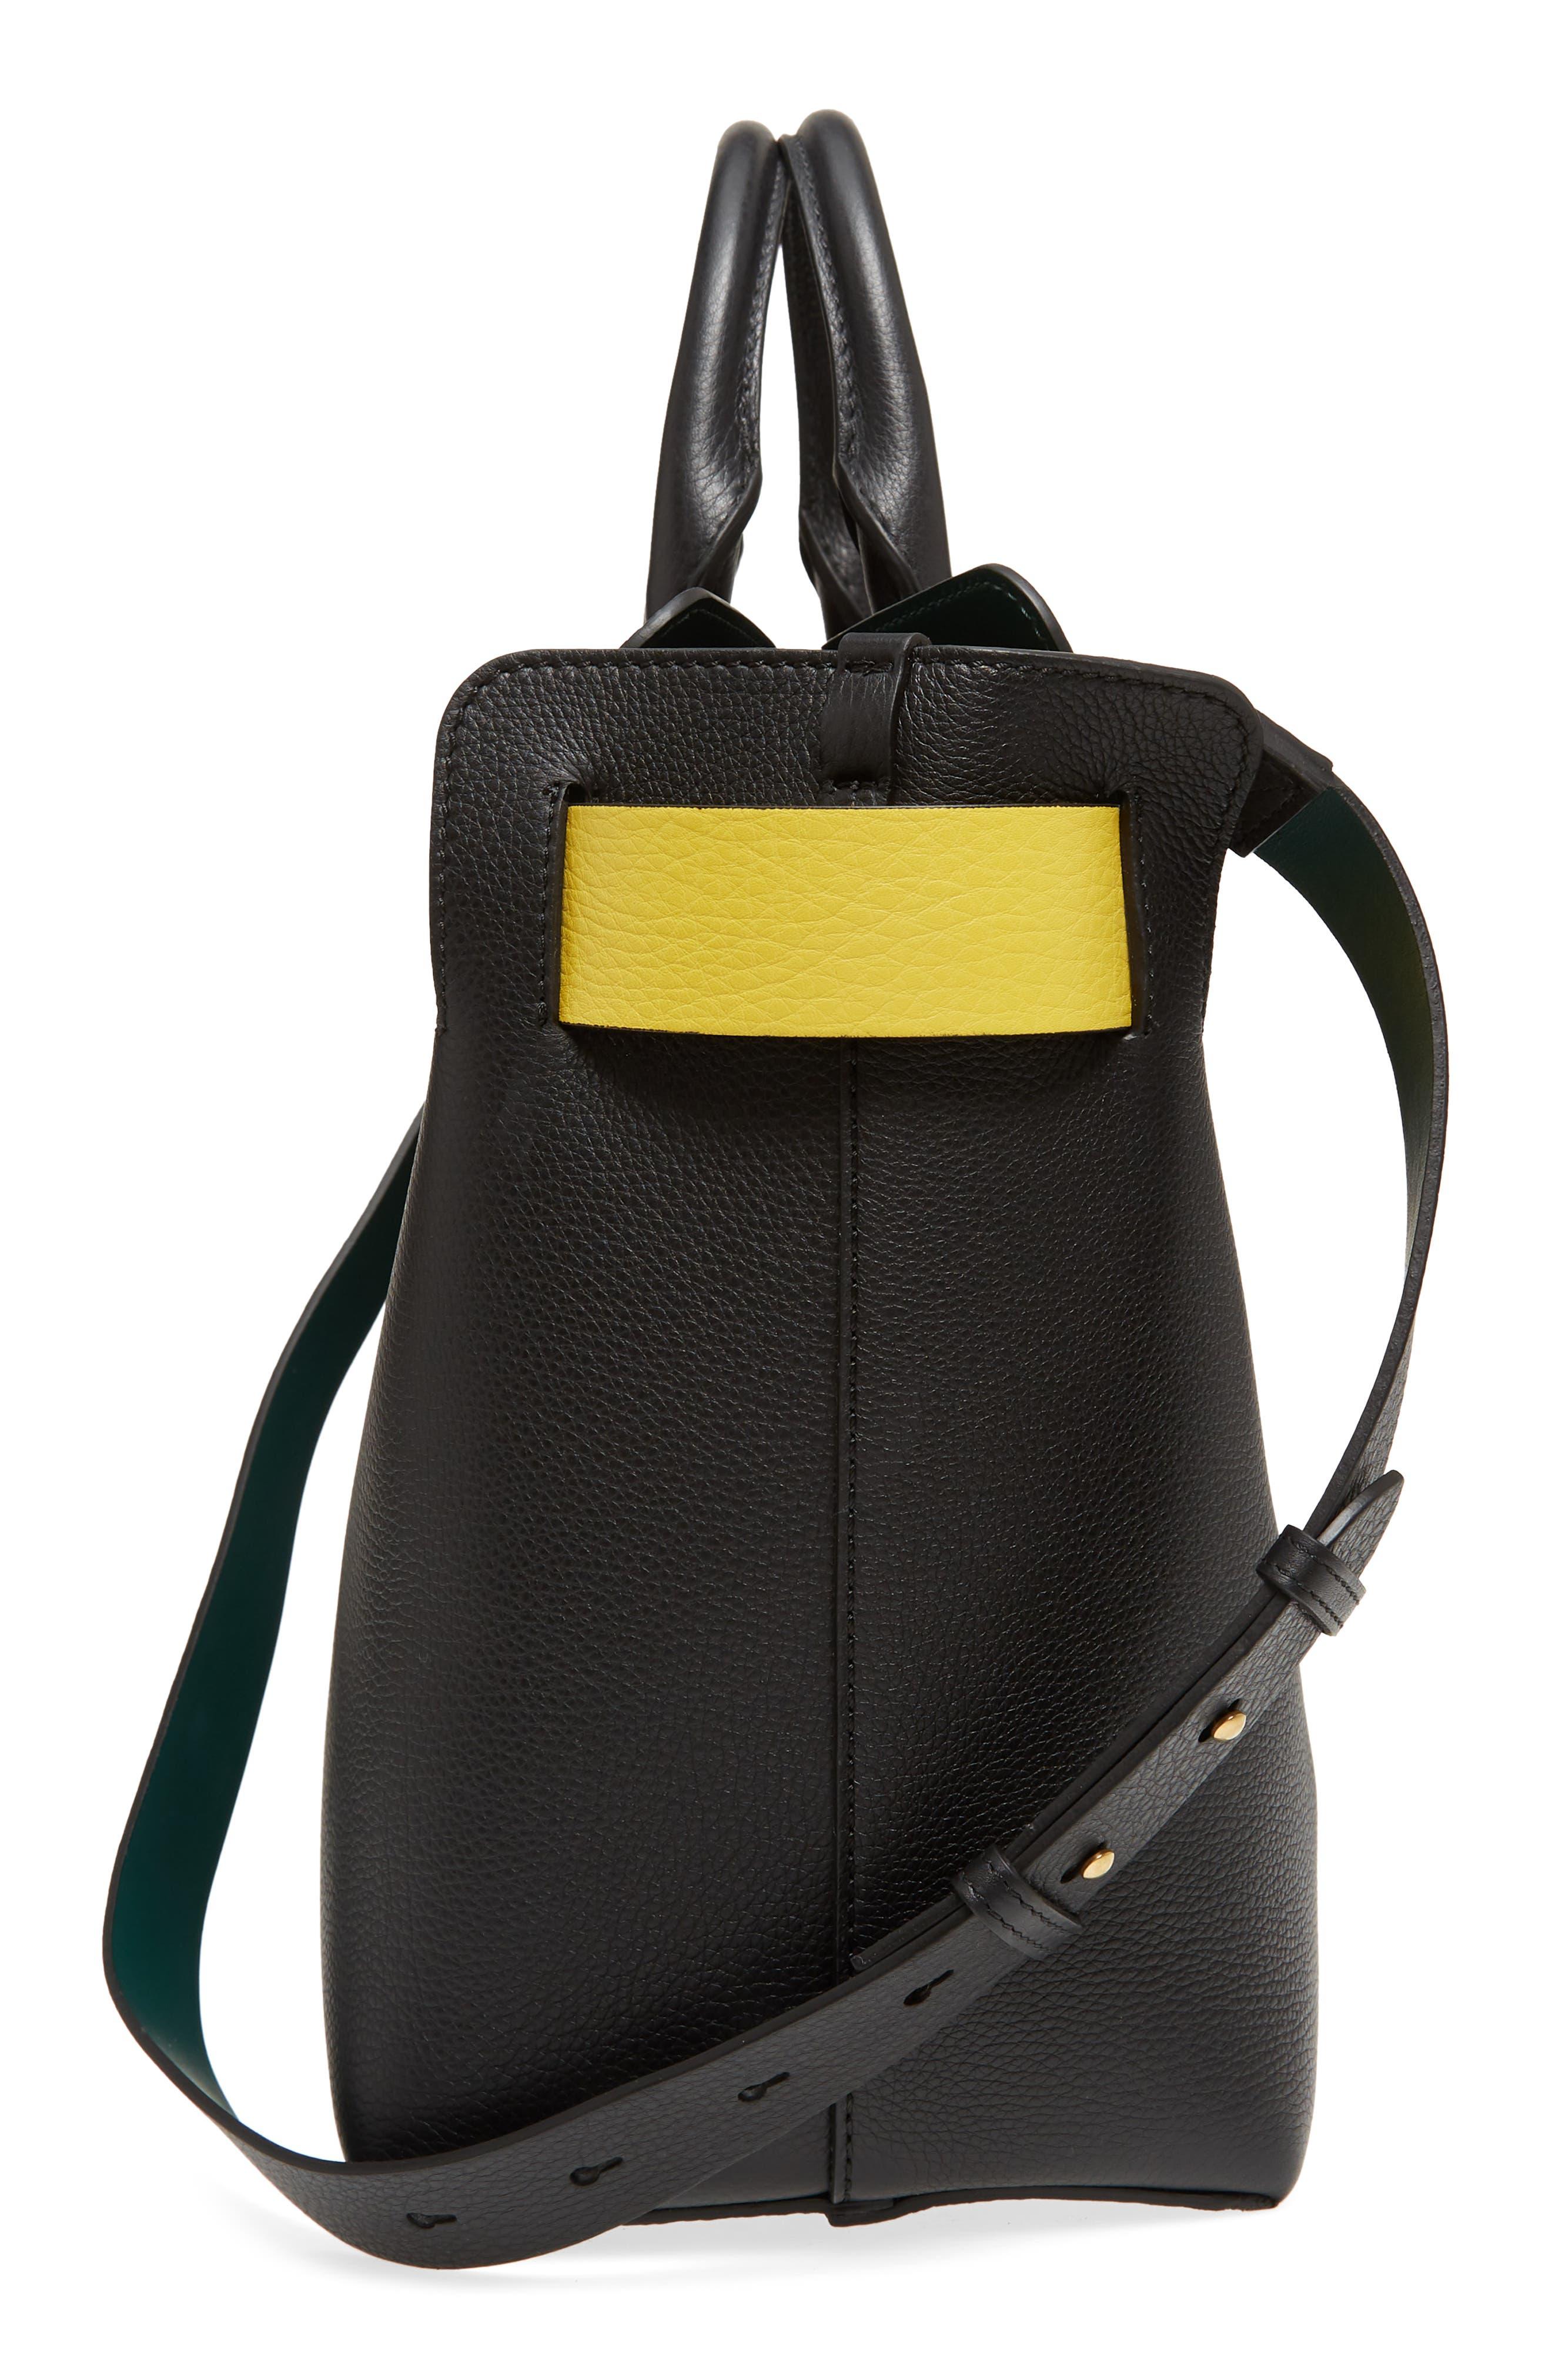 Medium Belt Bag Leather Tote,                             Alternate thumbnail 6, color,                             001